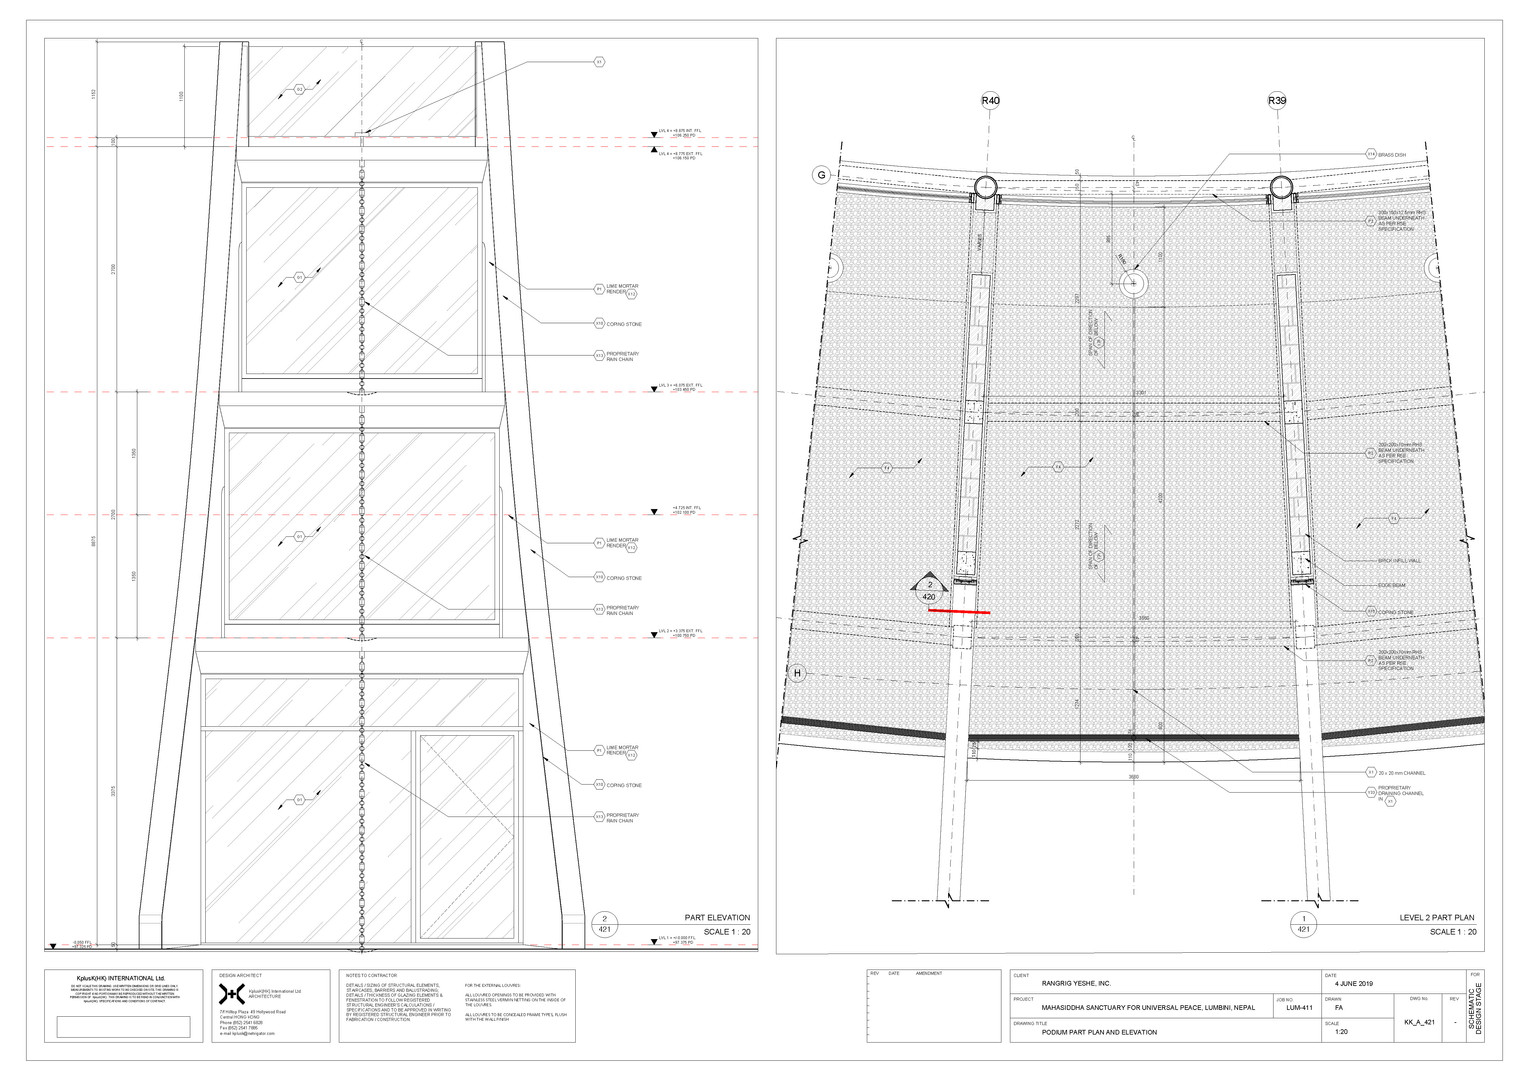 KK_A_421 Podium Part Plan and Elevation.